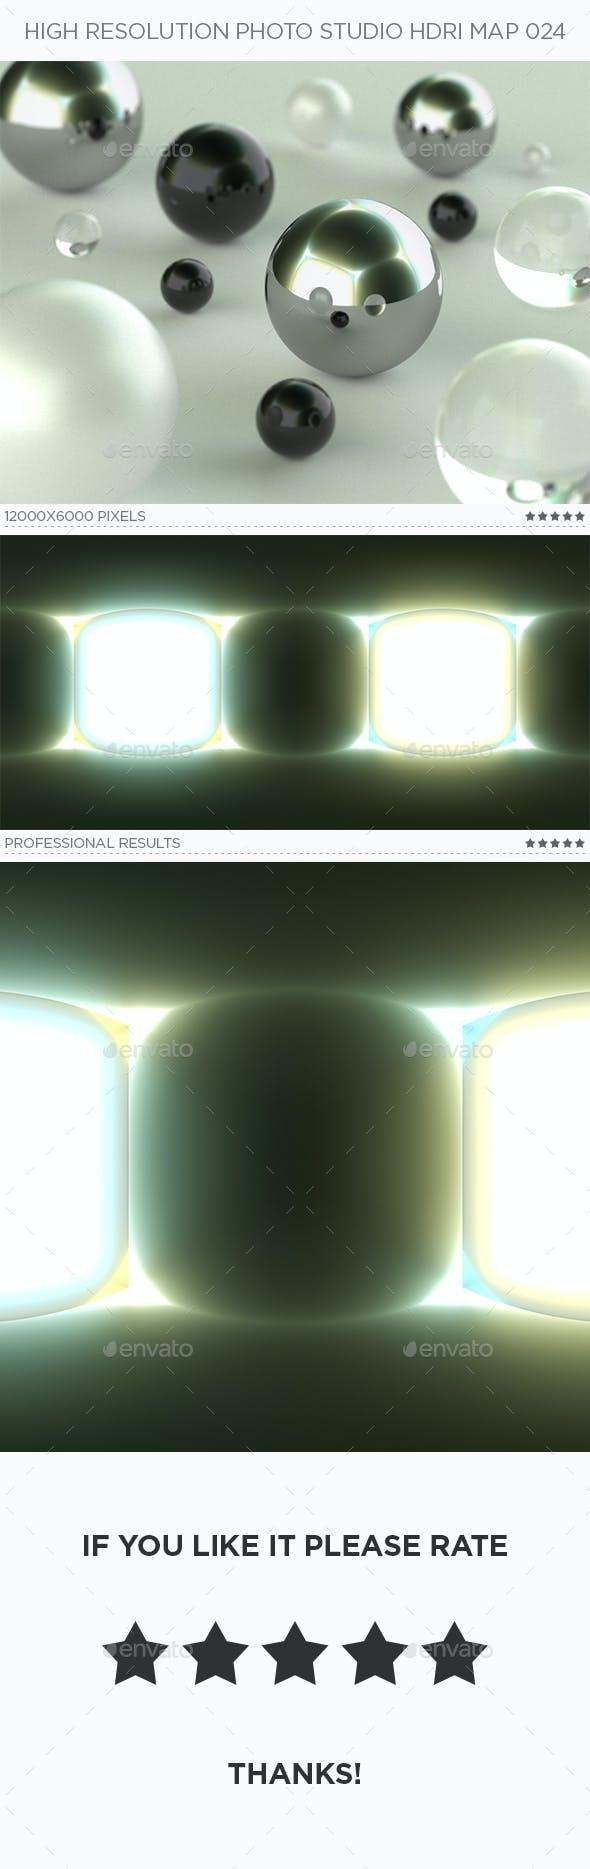 High Resolution Photo Studio HDRi Map 024 - 3DOcean Item for Sale